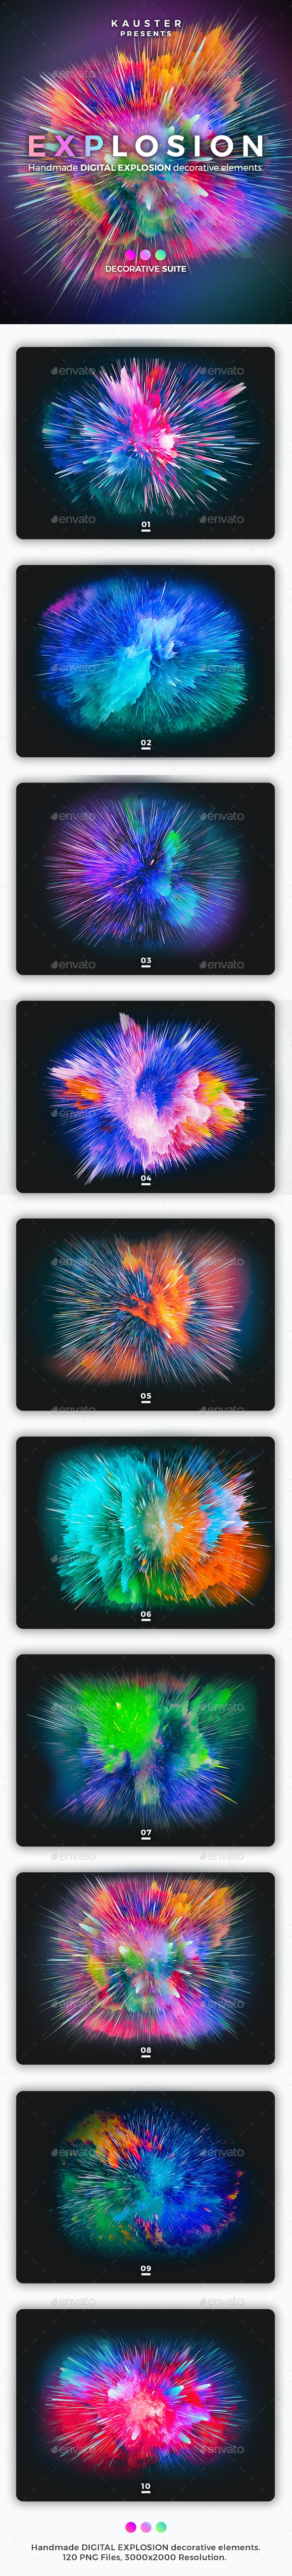 Digital Explosion Decorative Suite - Decorative Symbols Decorative